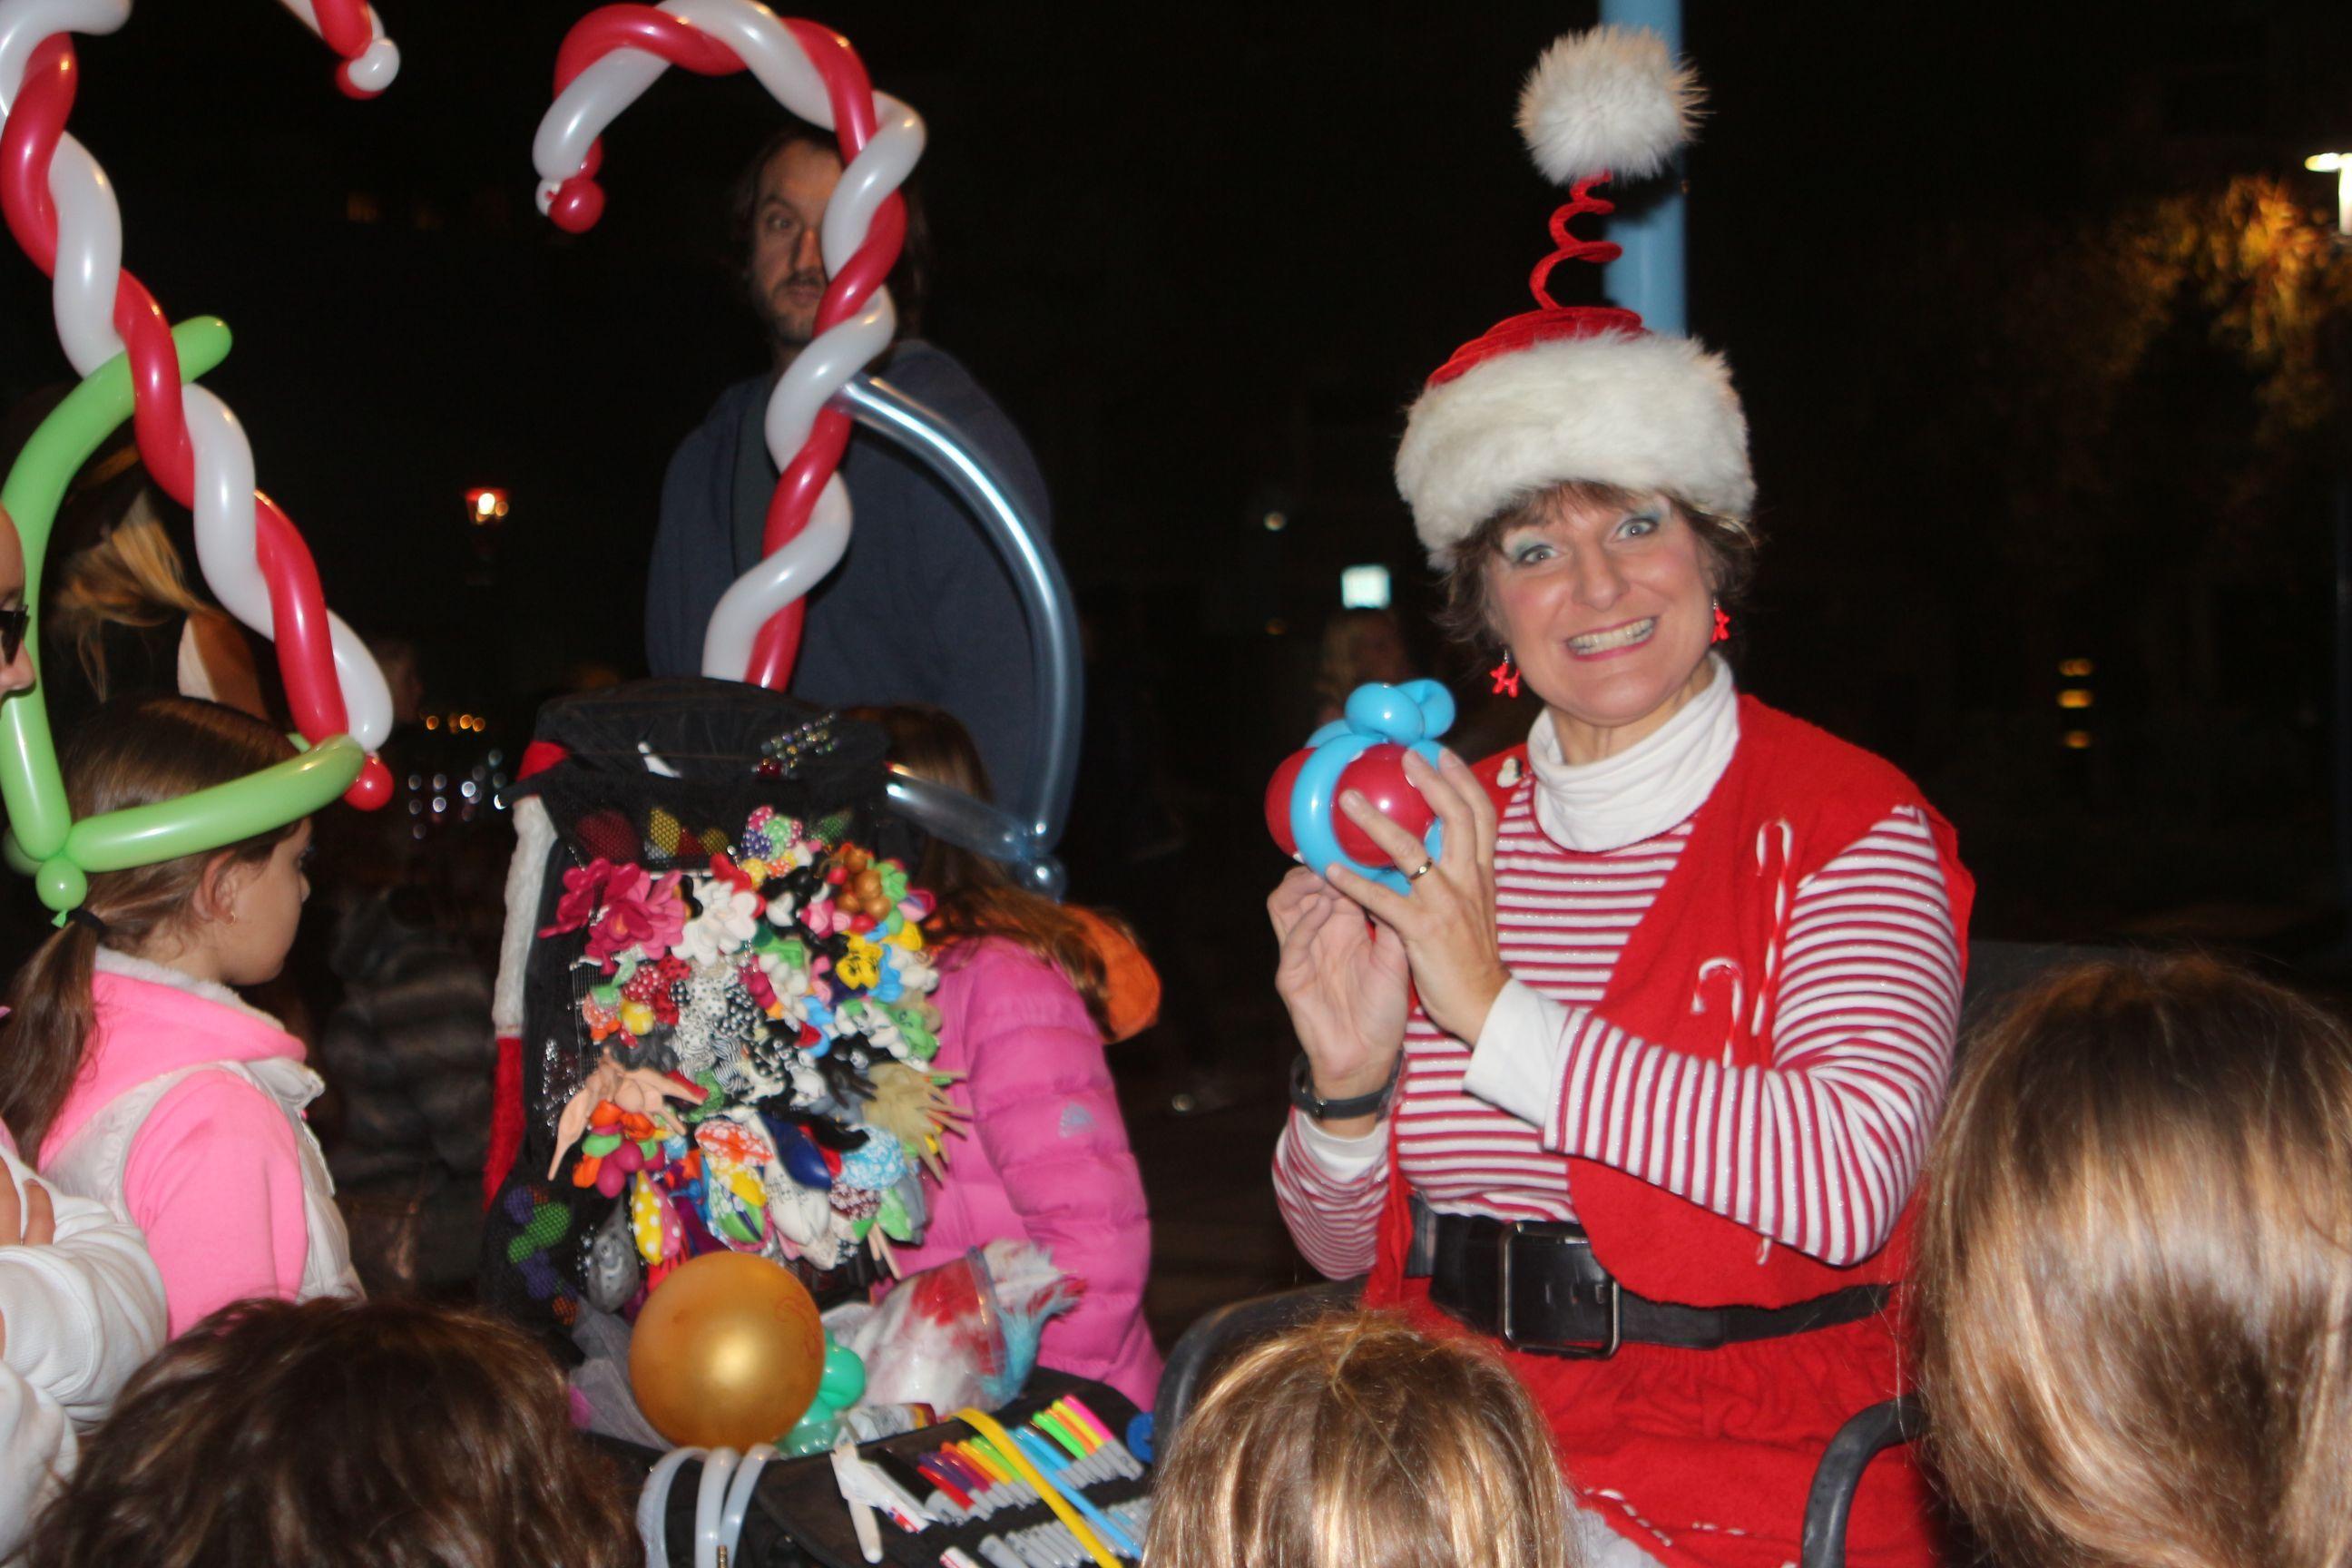 One of Santa's elves makes holiday balloon art